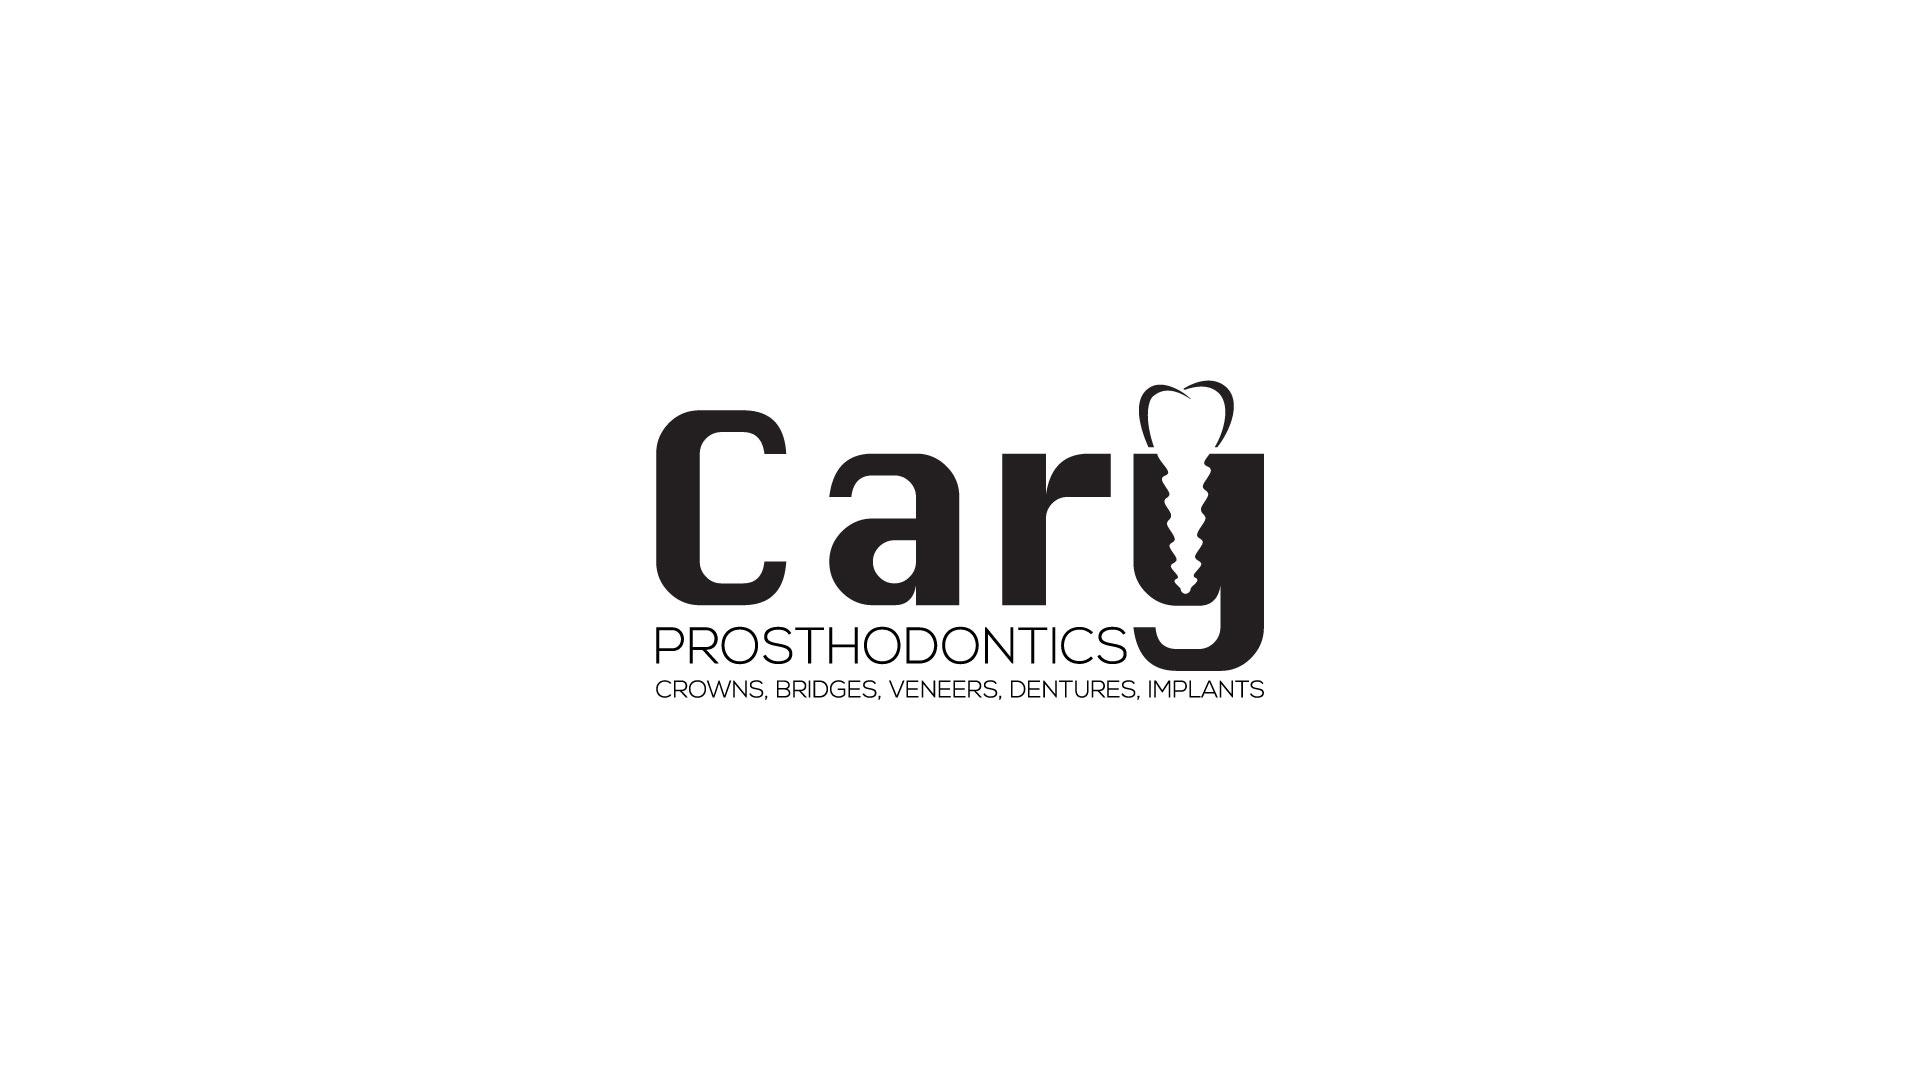 Logo Design by MD SHOHIDUL ISLAM - Entry No. 81 in the Logo Design Contest Cary Prosthodontics Logo Design.